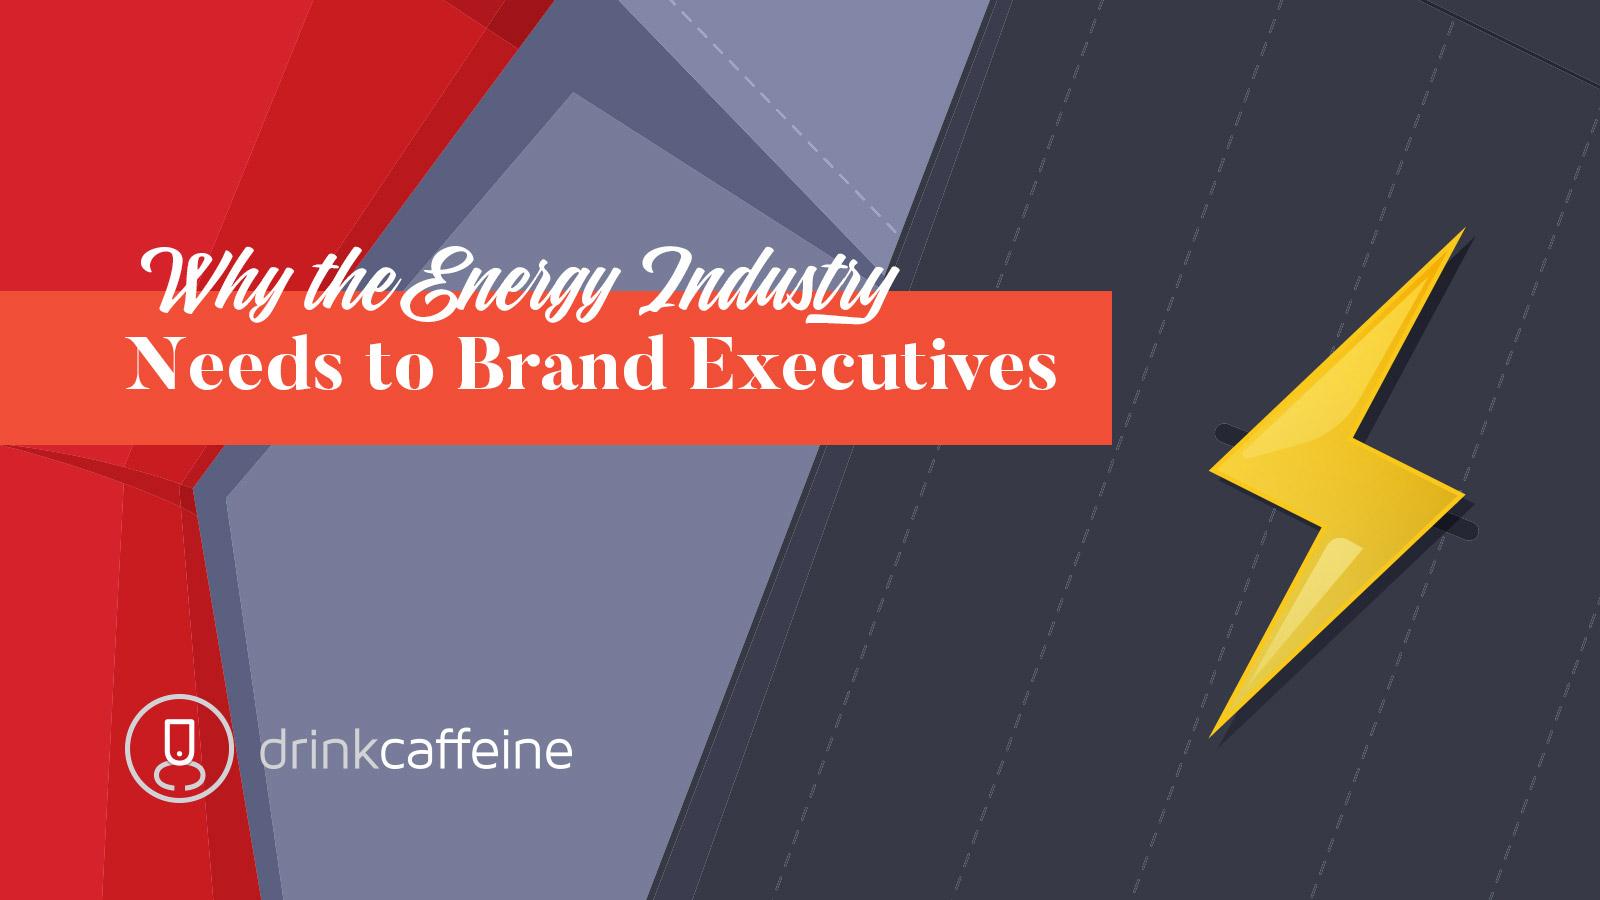 How energy companies can make executive branding a powerful tool blog image